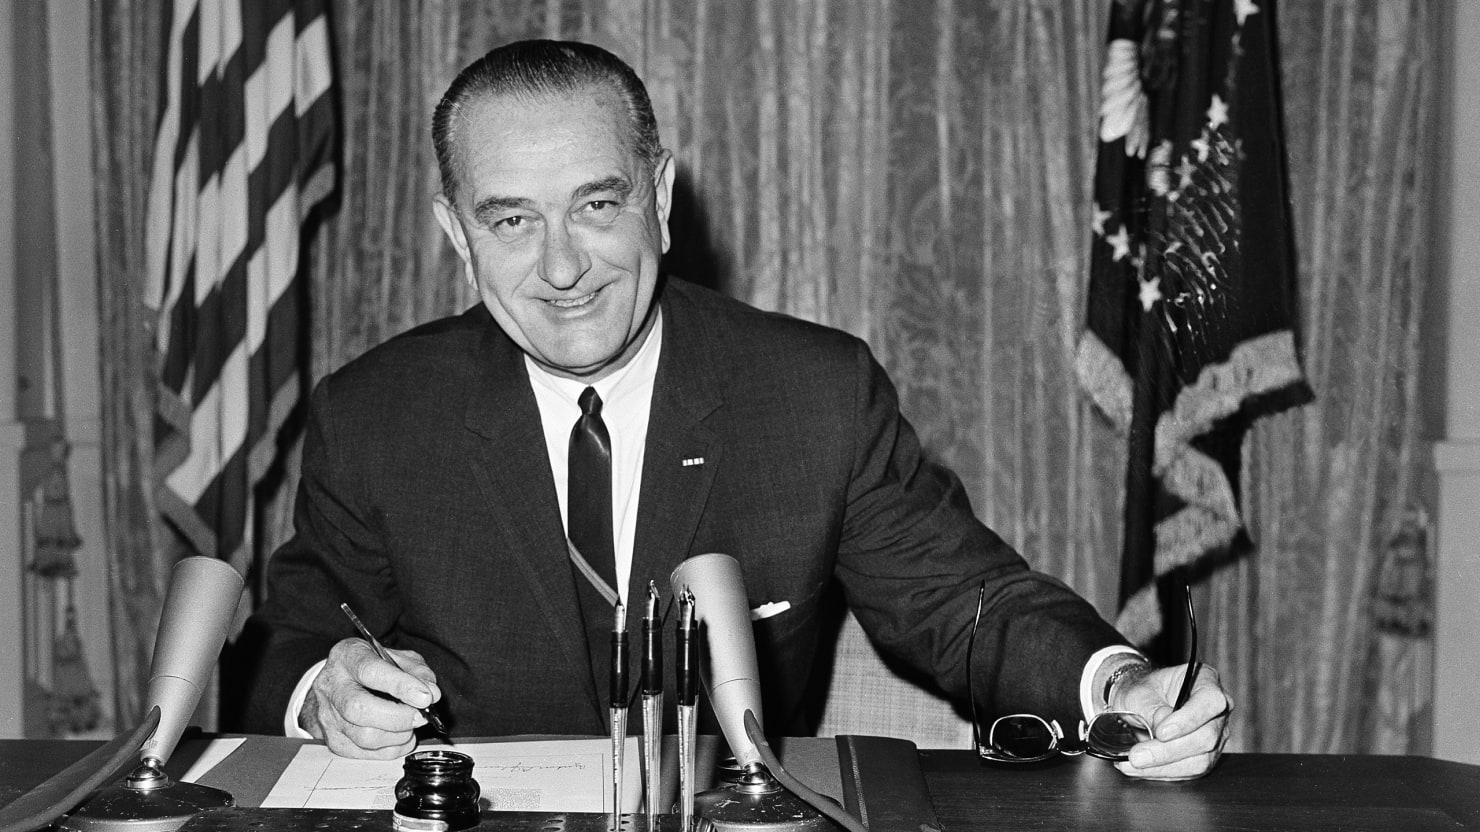 lyndon johnson and the great society Lyndon baines johnson (stonewall, texas, 27 de agosto de 1908-ibídem, 22 de enero de 1973), conocido por sus iniciales,  (the great society):.